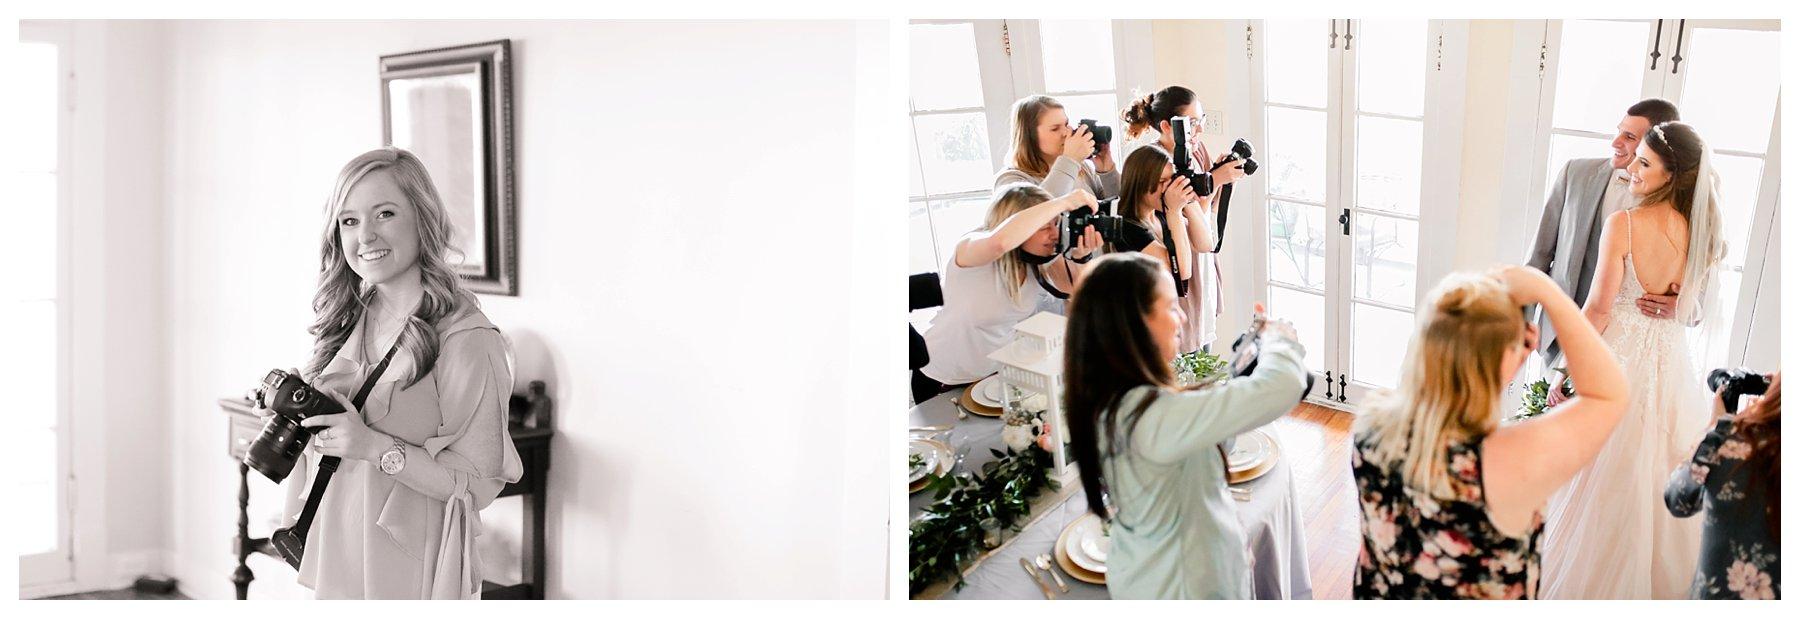 photographer_wedding_saint_louis_Kansas_City_Photography_Videography_workshop_training_styled_engagement_Lake_Ozark_KC_MO_STL_Rolla_Hermann_Saint_James_0369.jpg